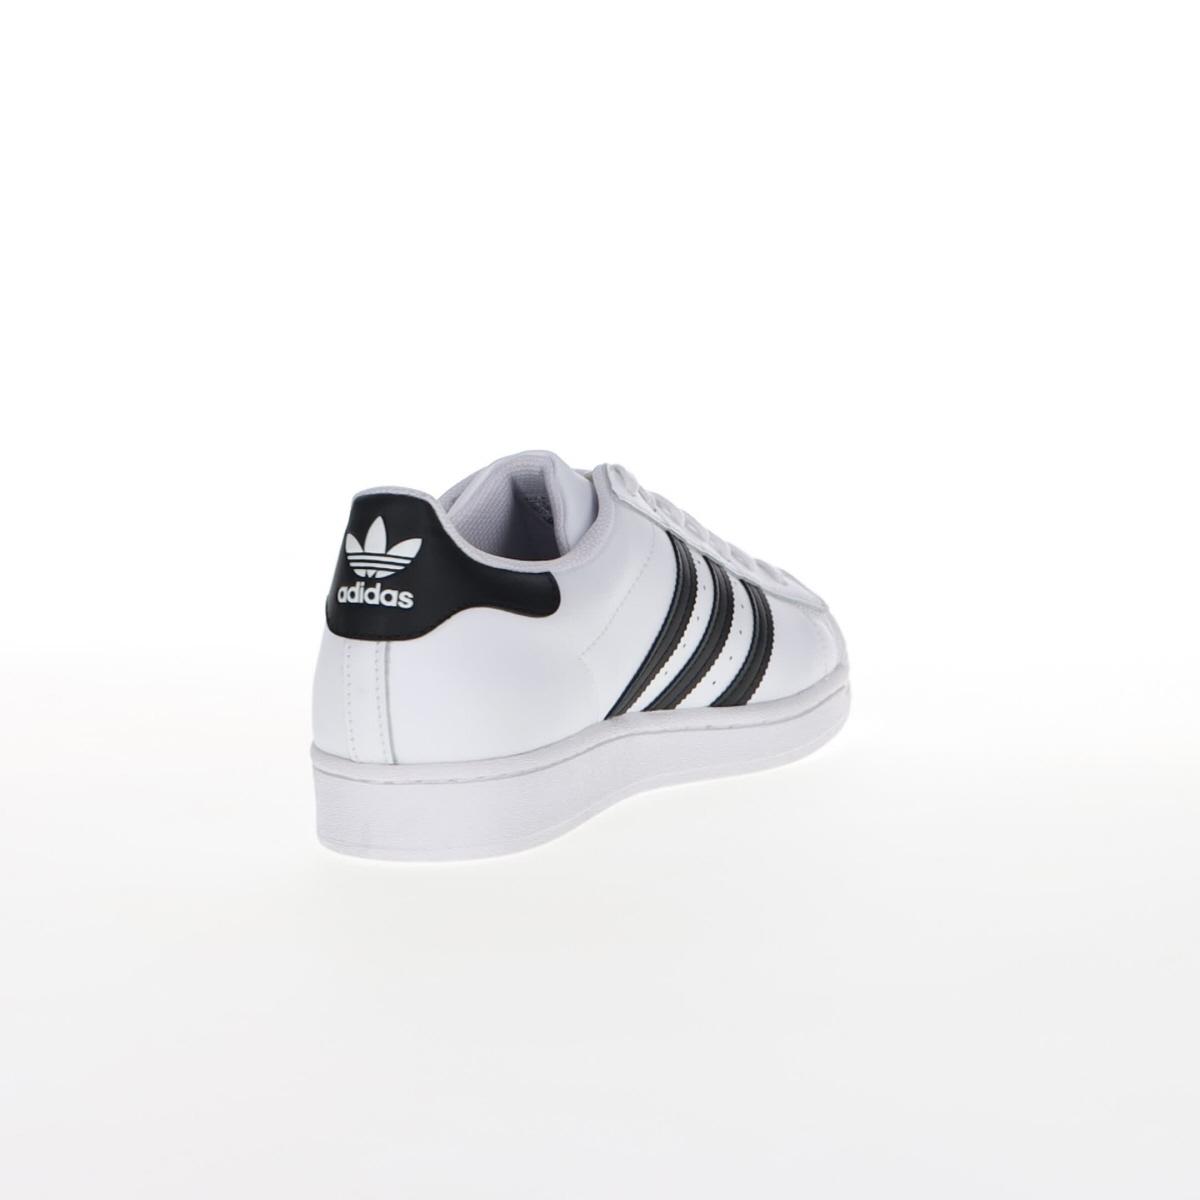 adidas babypakje shoes black gold women s shoe